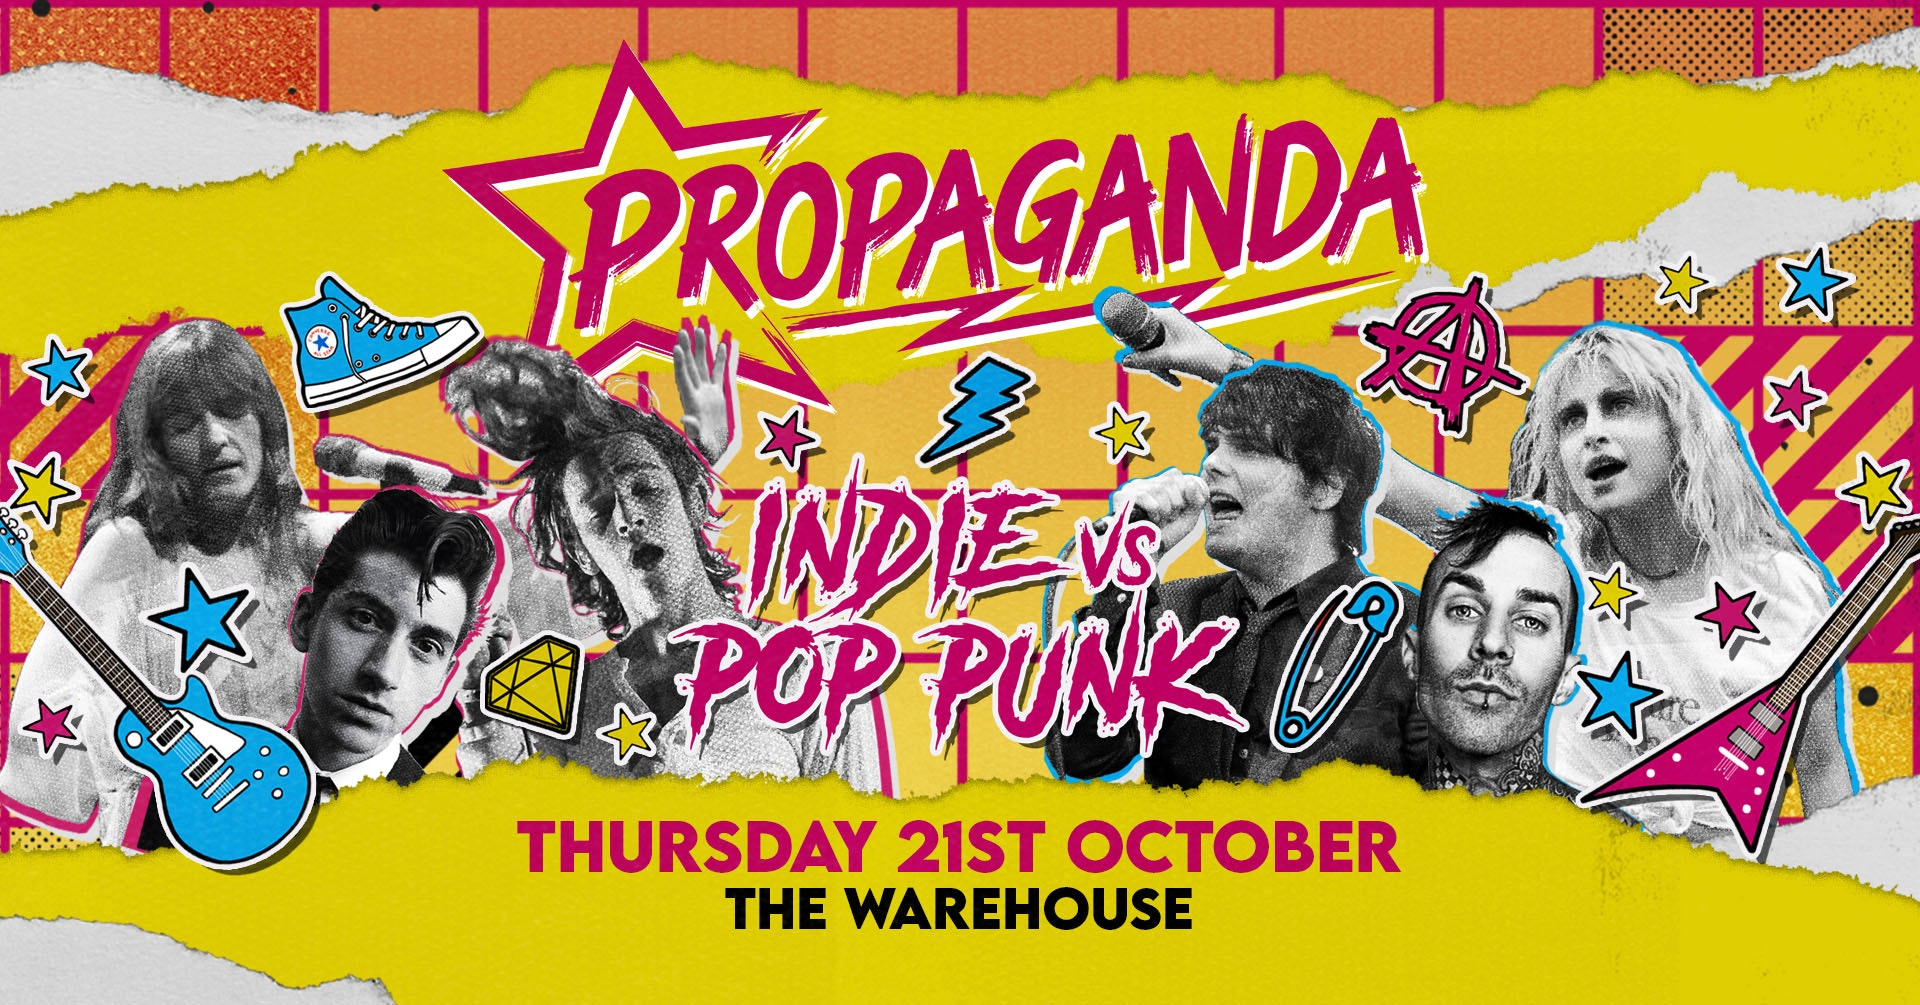 Propaganda Leeds – Indie vs Pop-Punk!